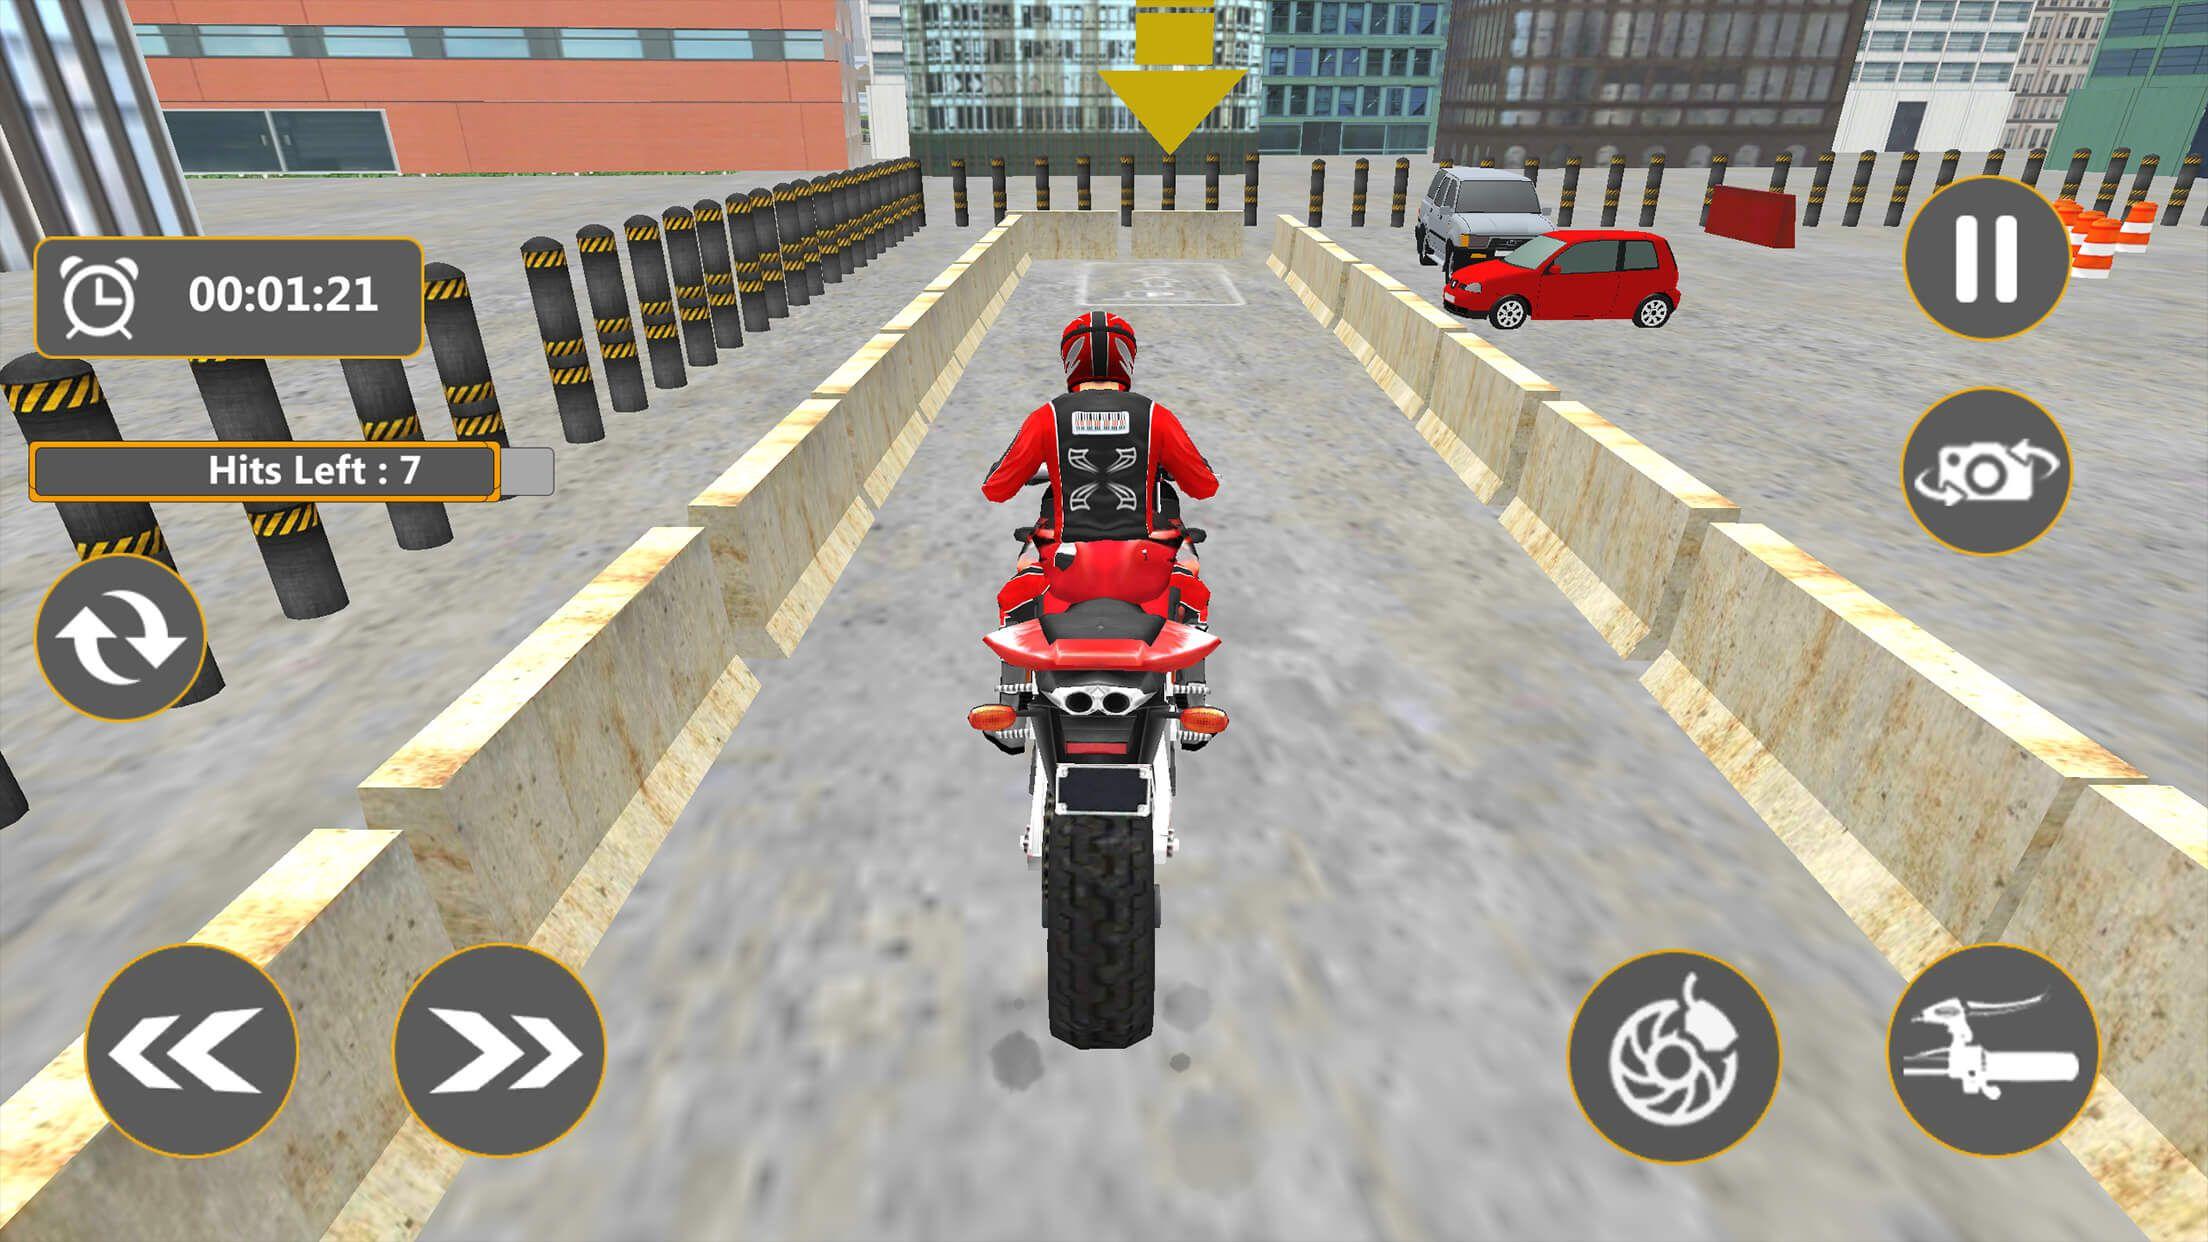 Real Bike Parking 2017 3D游戏安卓版图片1